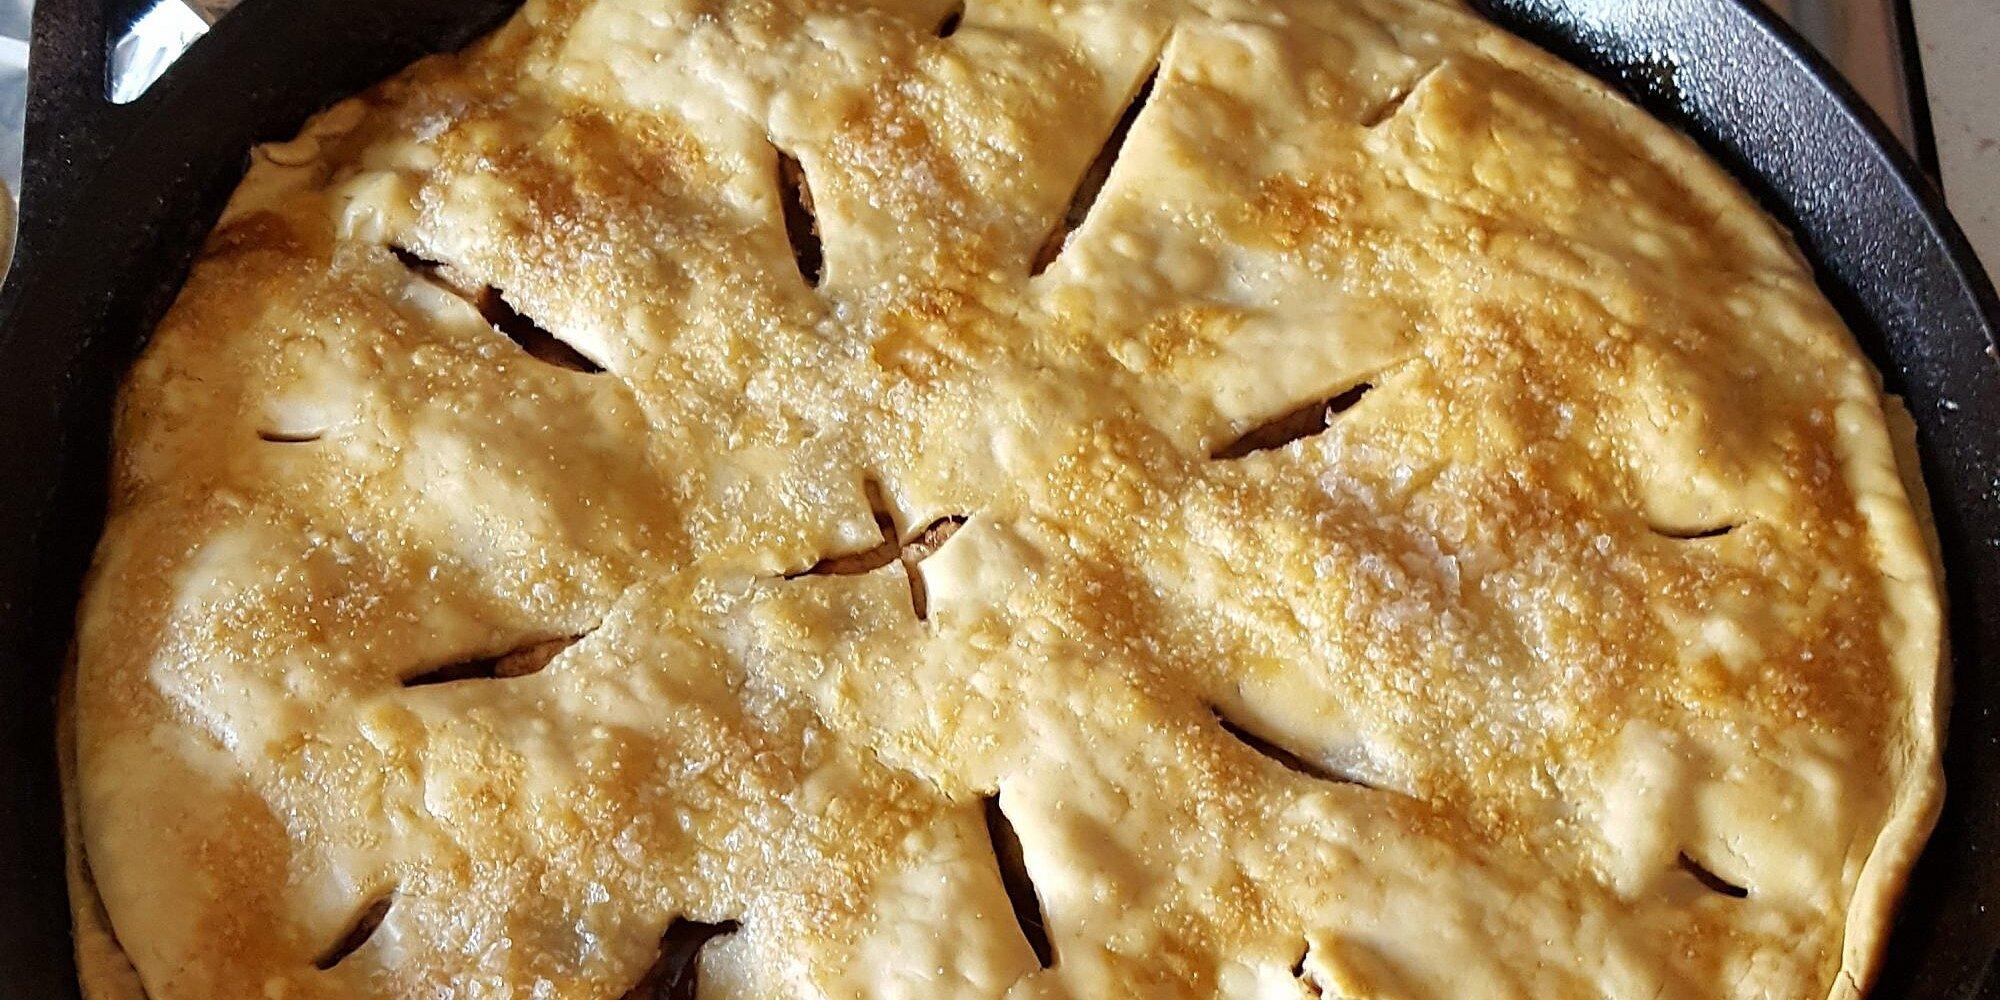 15 Classic Grandma Desserts You'll Love to Make and Share